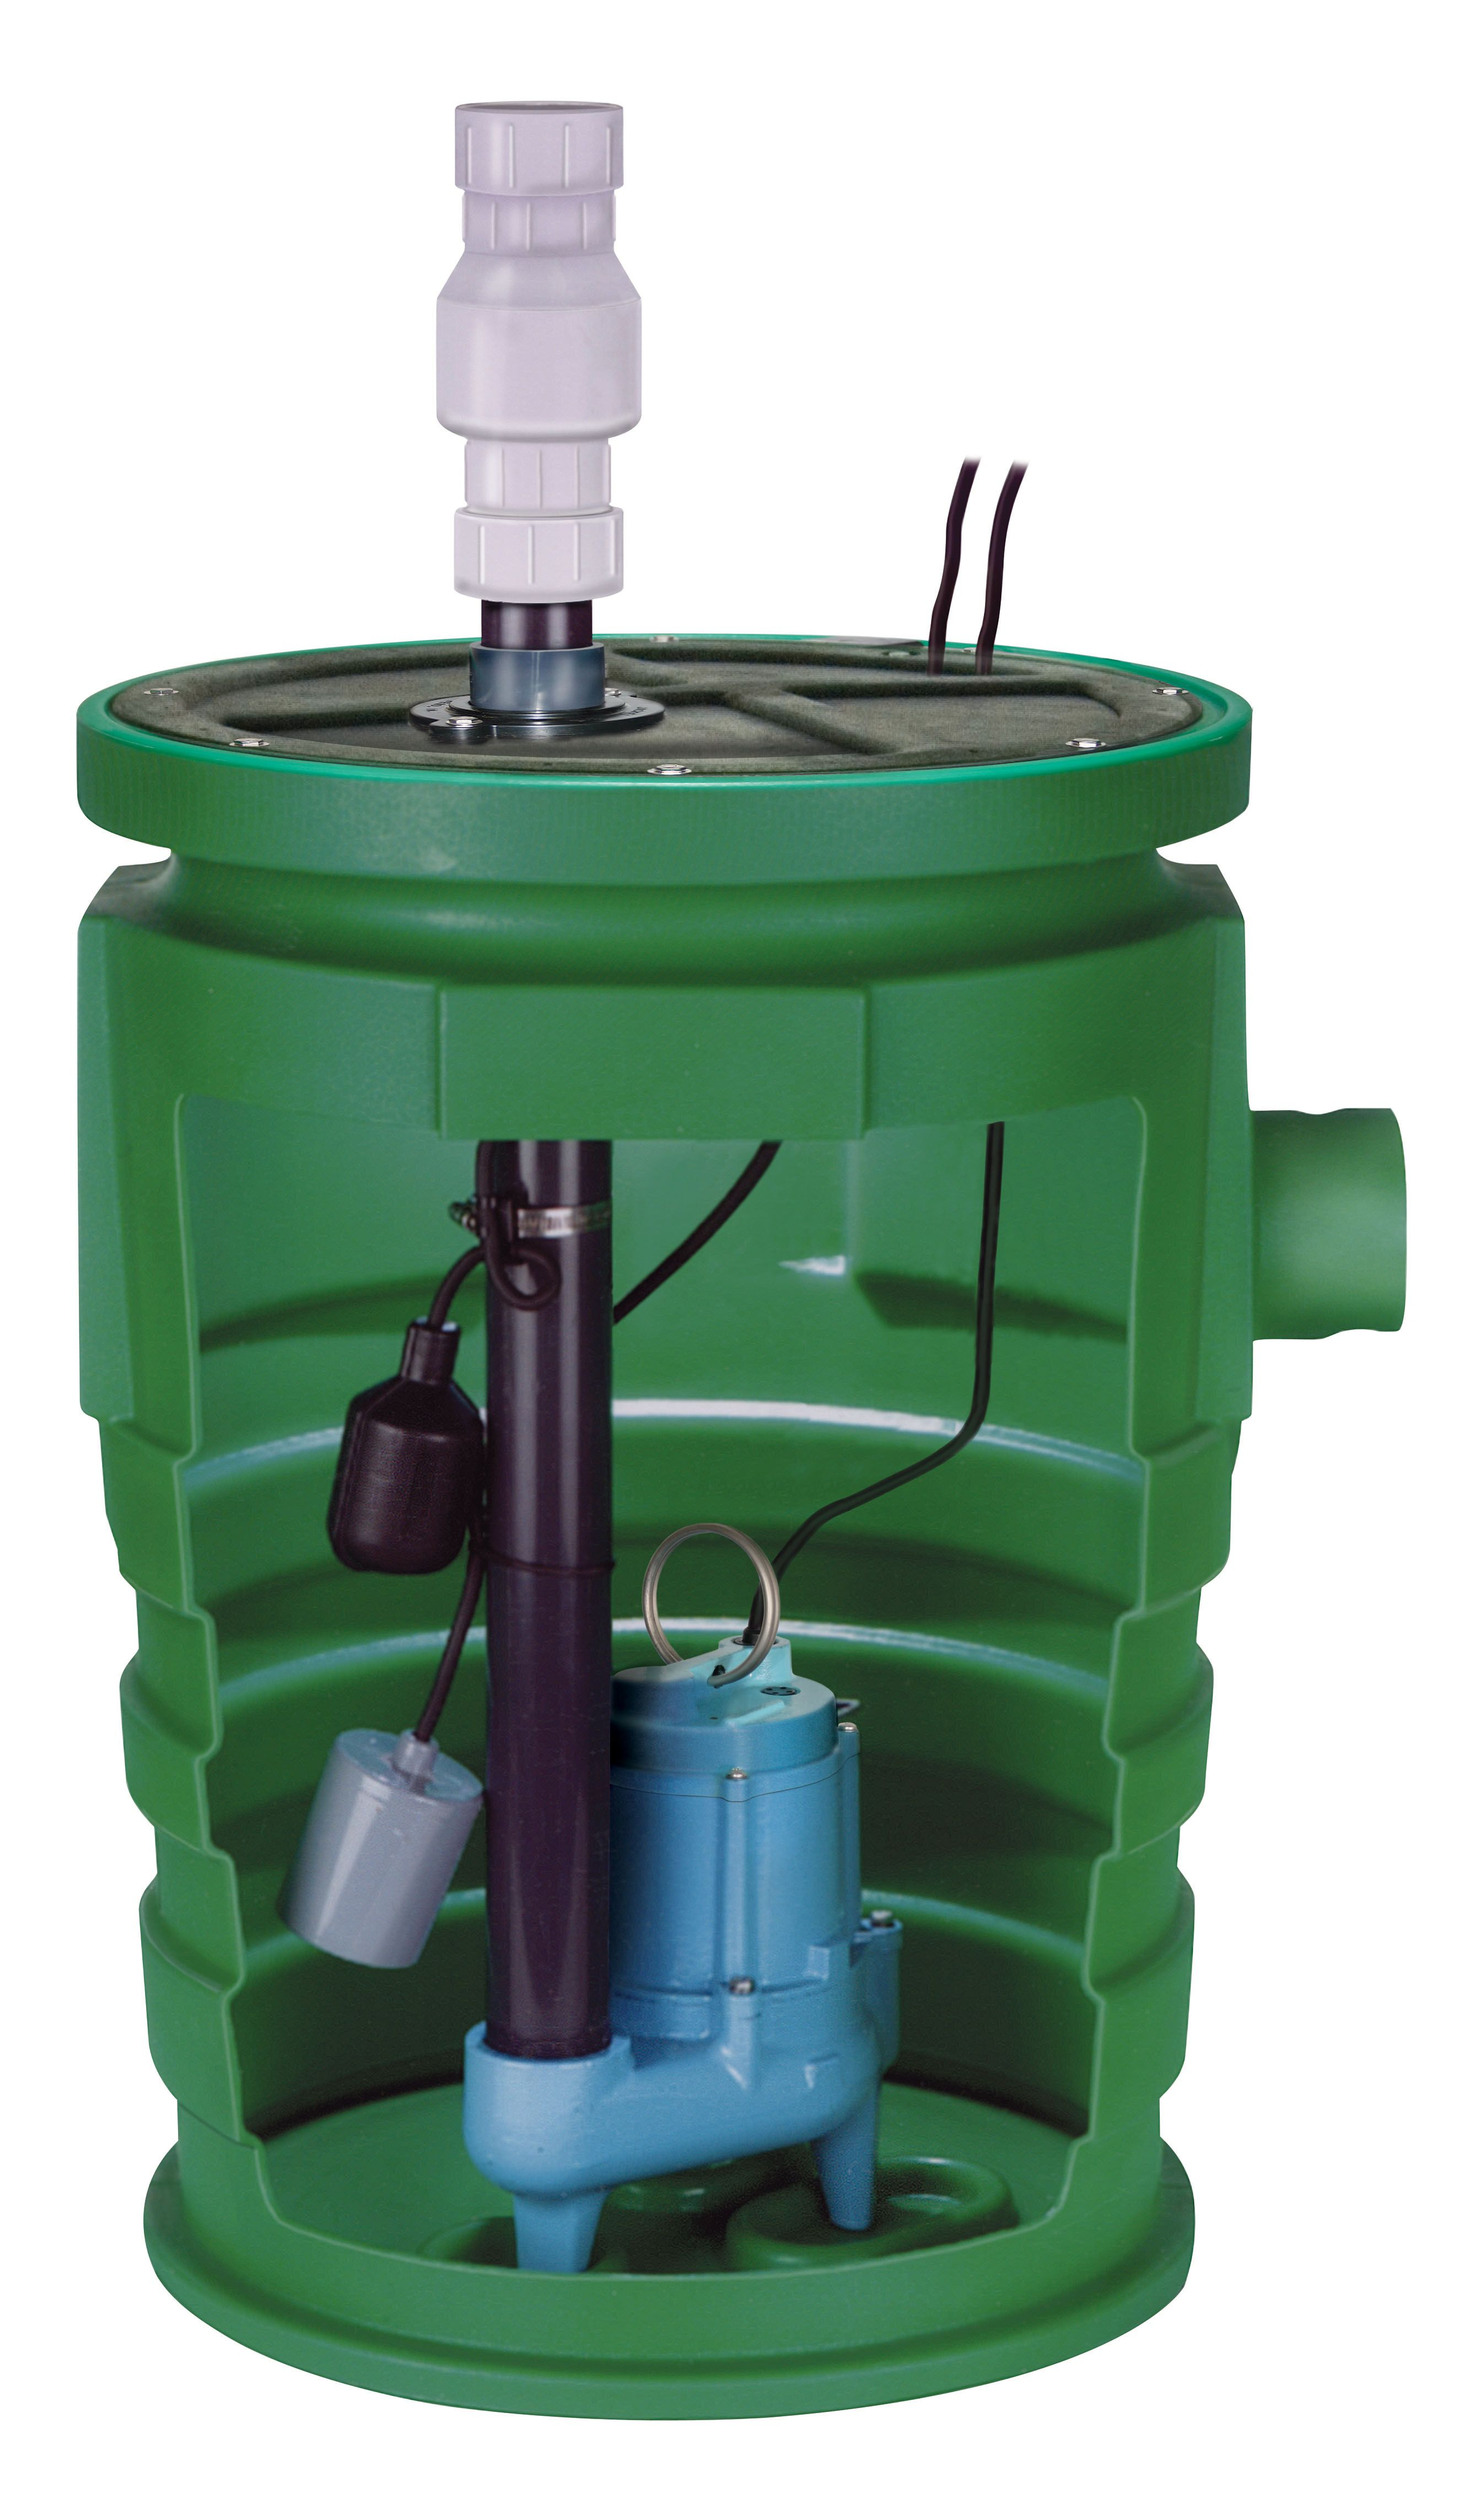 medium resolution of 509115 9s smpx lg1a bc2030csjk sewer pump sewage ejector pump